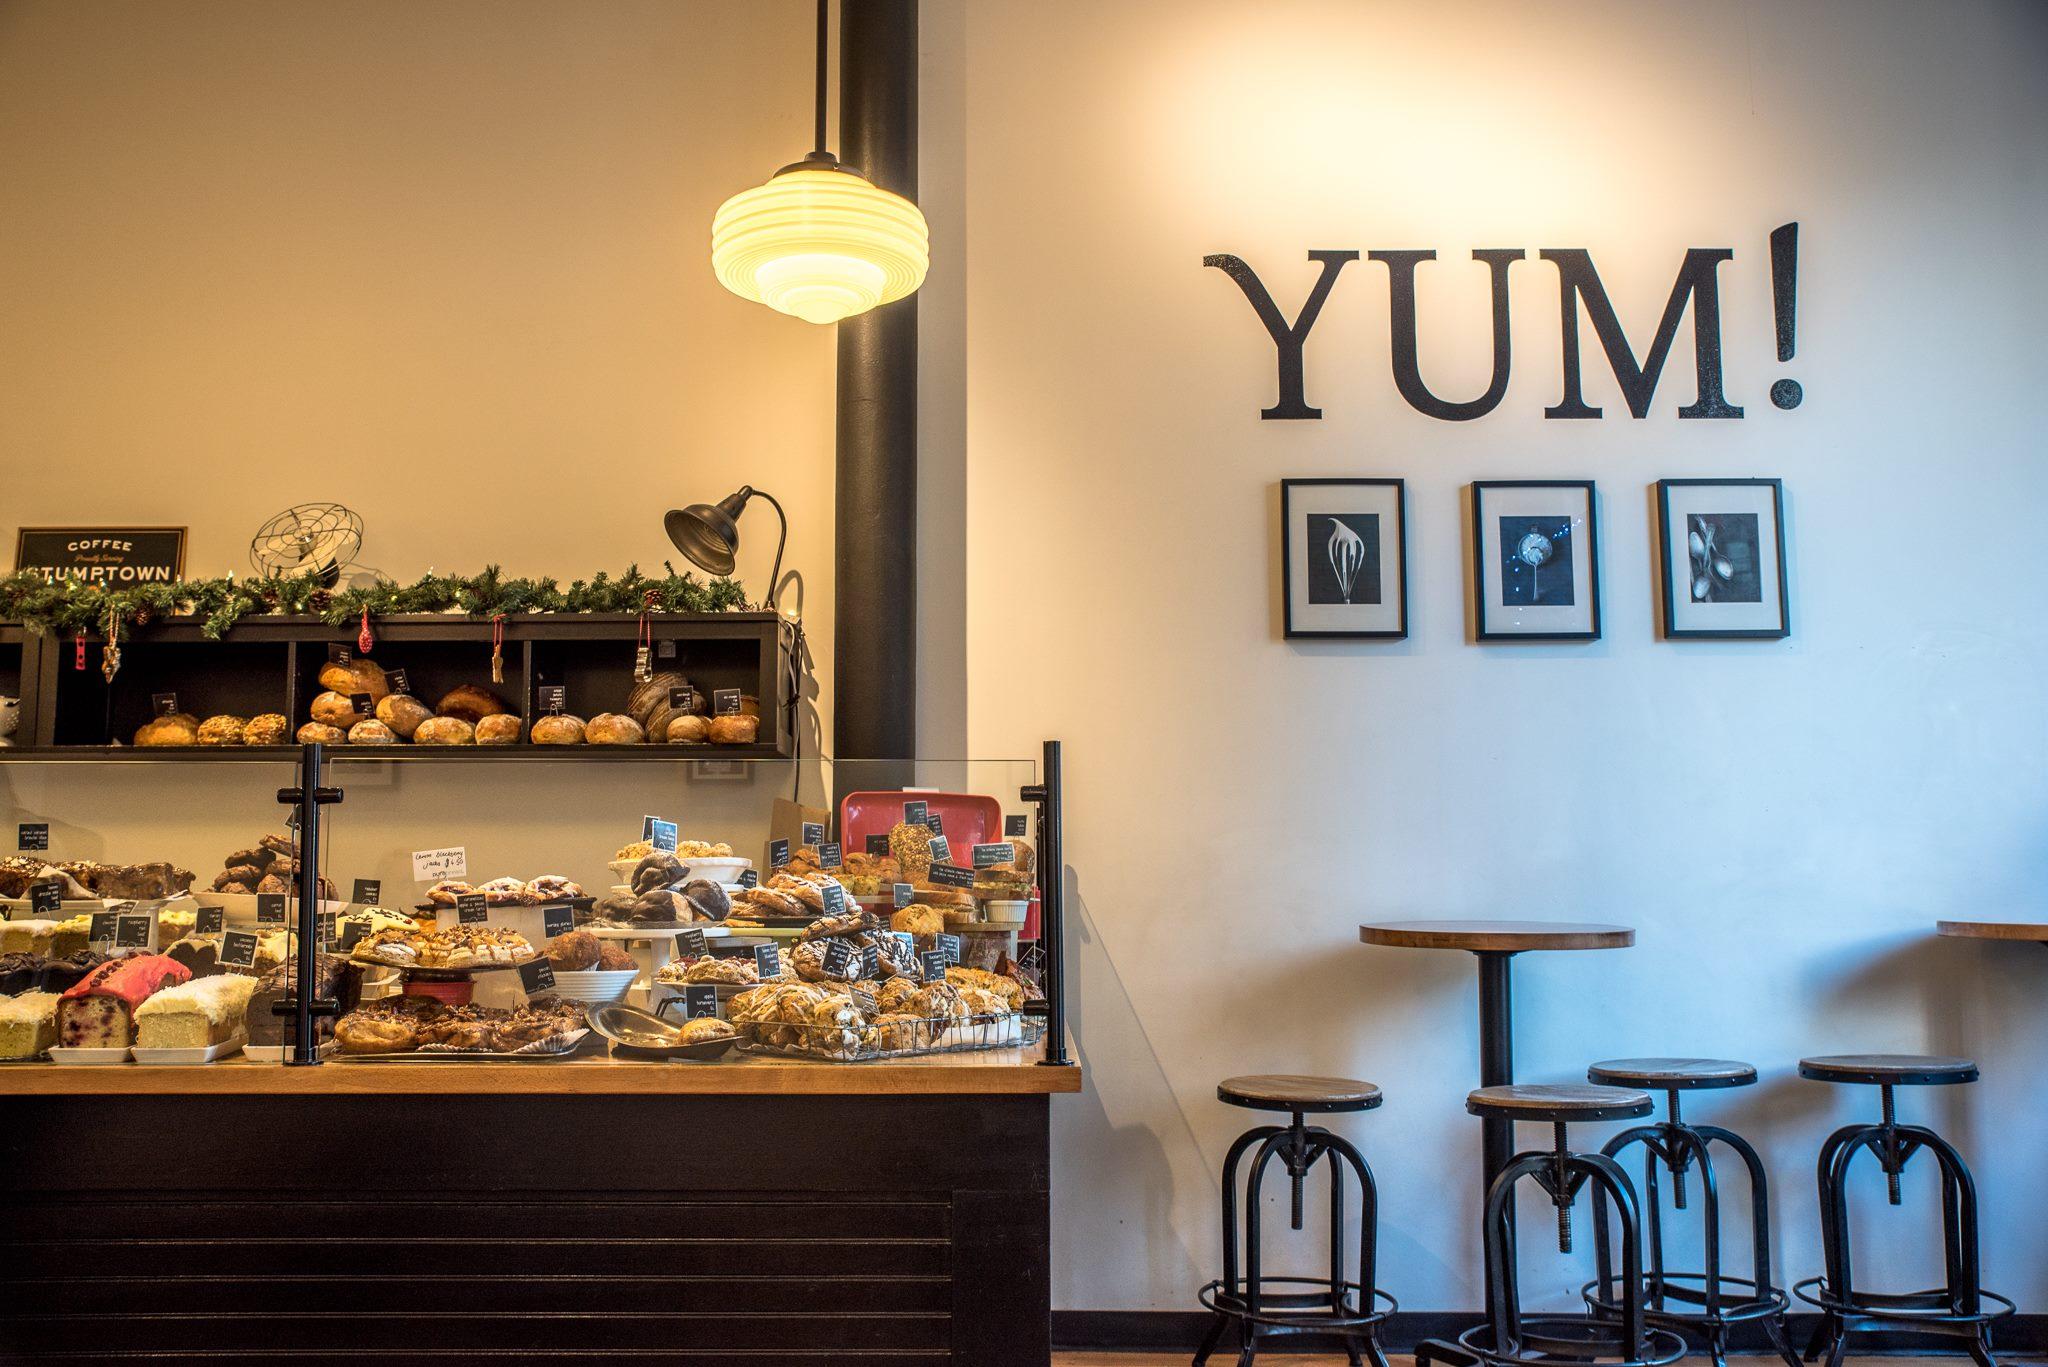 Purebread cafe, Vancouver